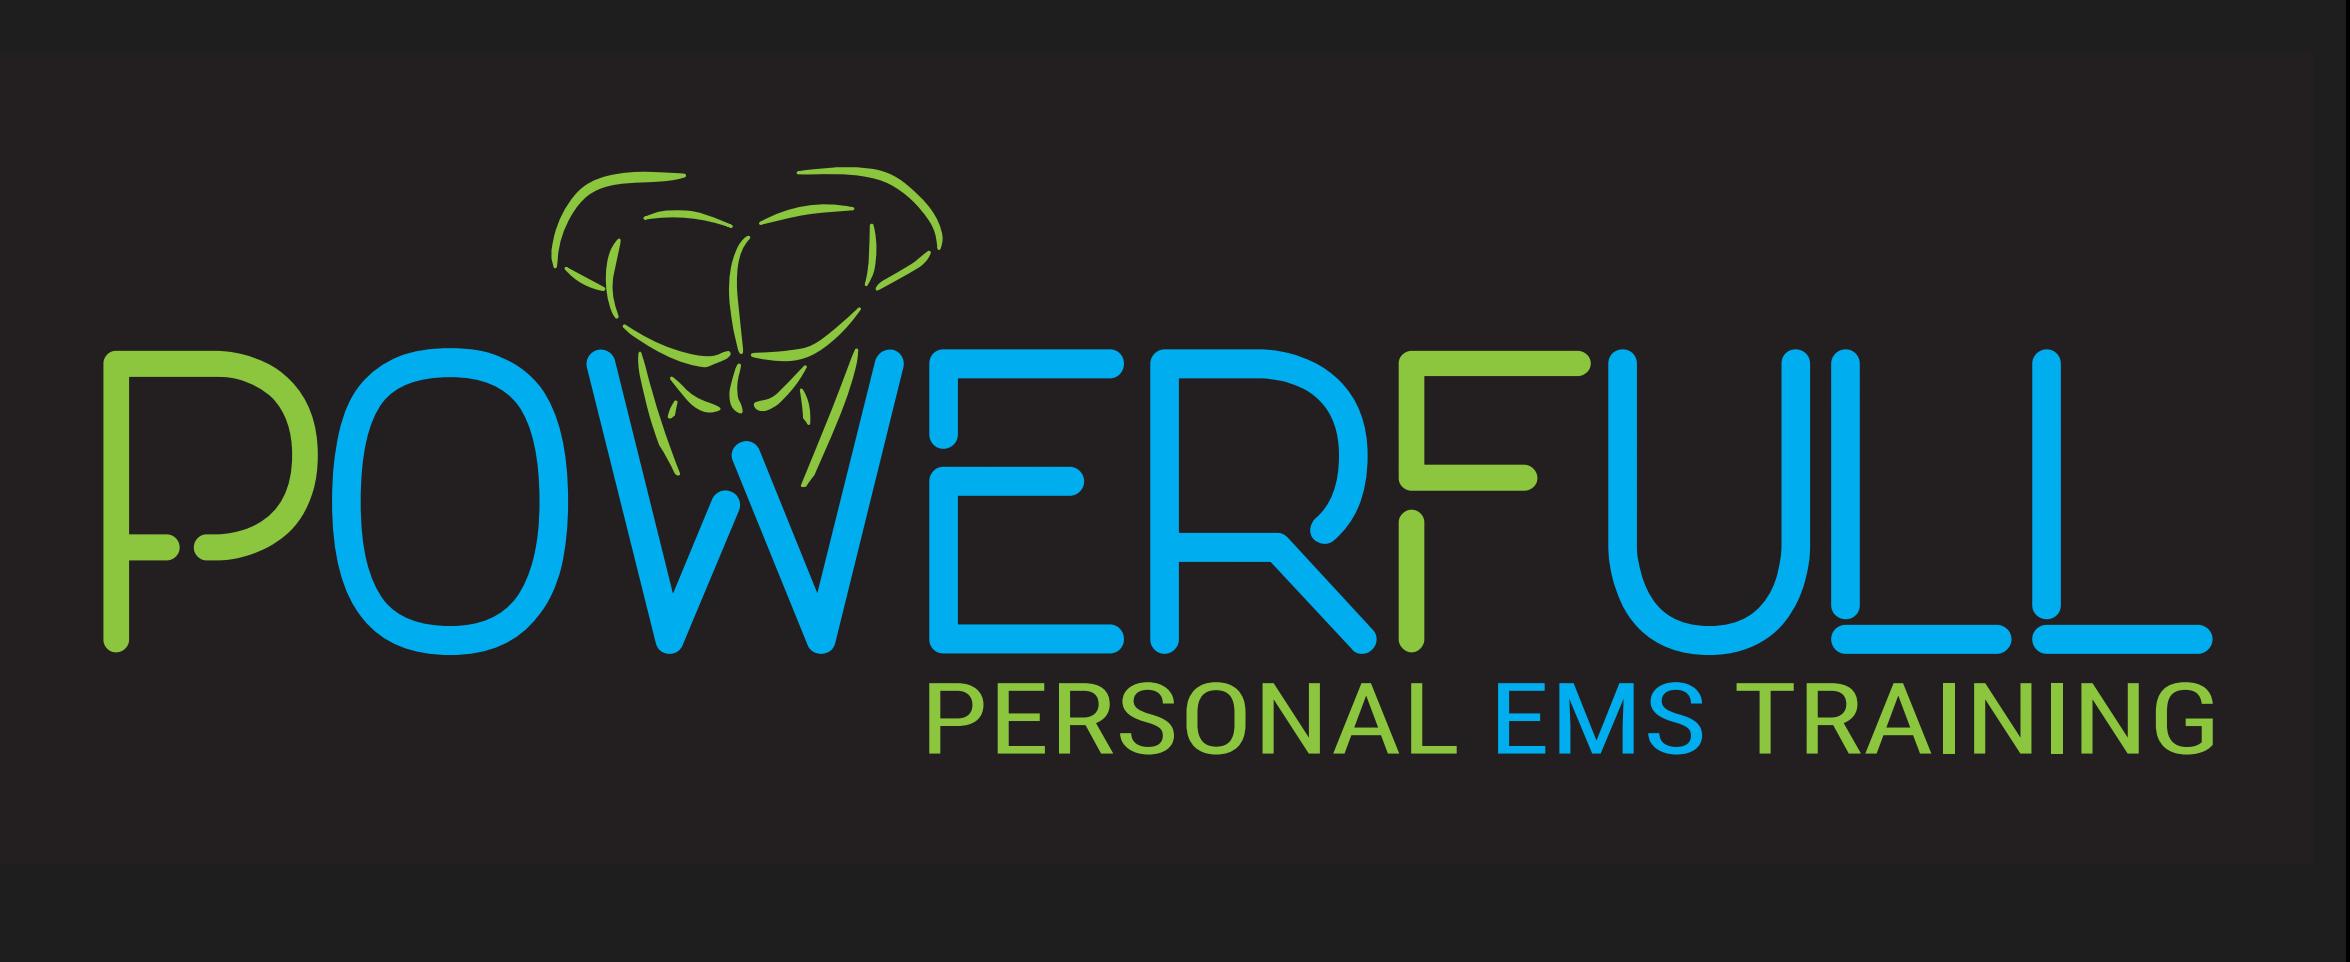 POWERFULL Personal EMS Training